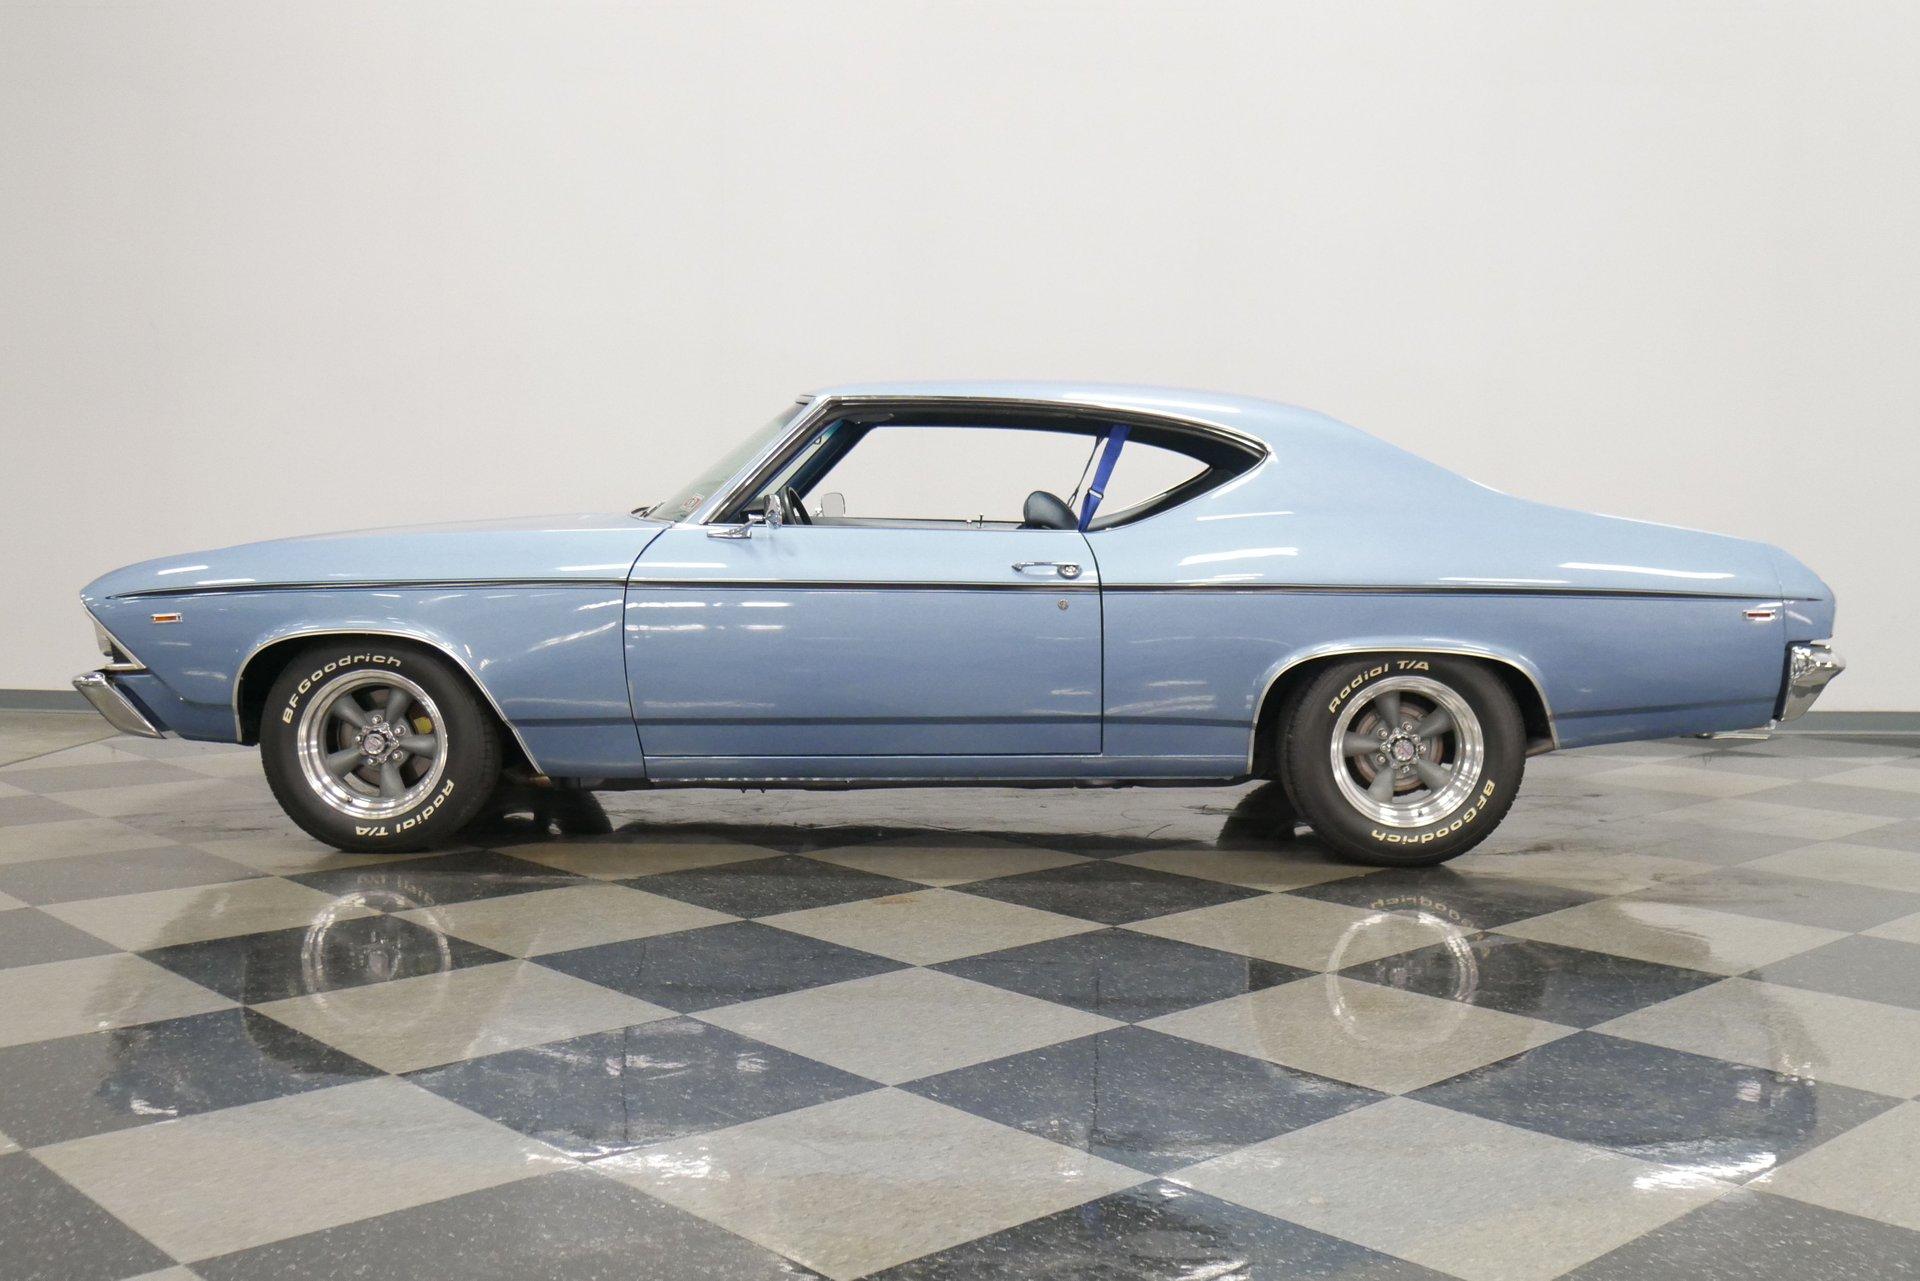 1969 chevrolet chevelle ss 396 tribute